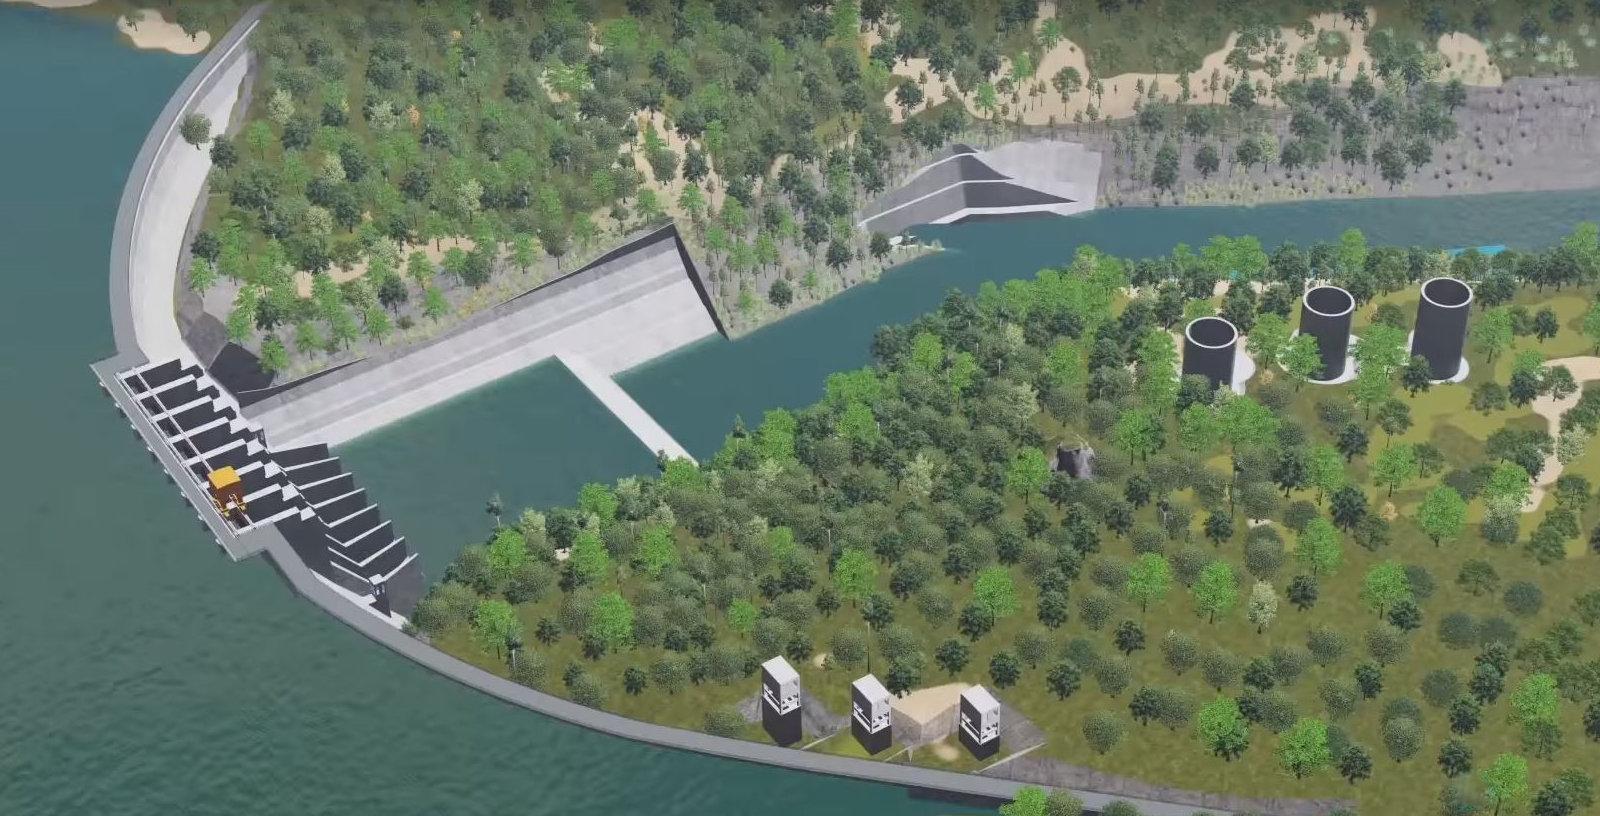 Rufiji_Hydropower_Plant_Contractors_Engineer_Tanzania_Elsewedy_IDOM_05